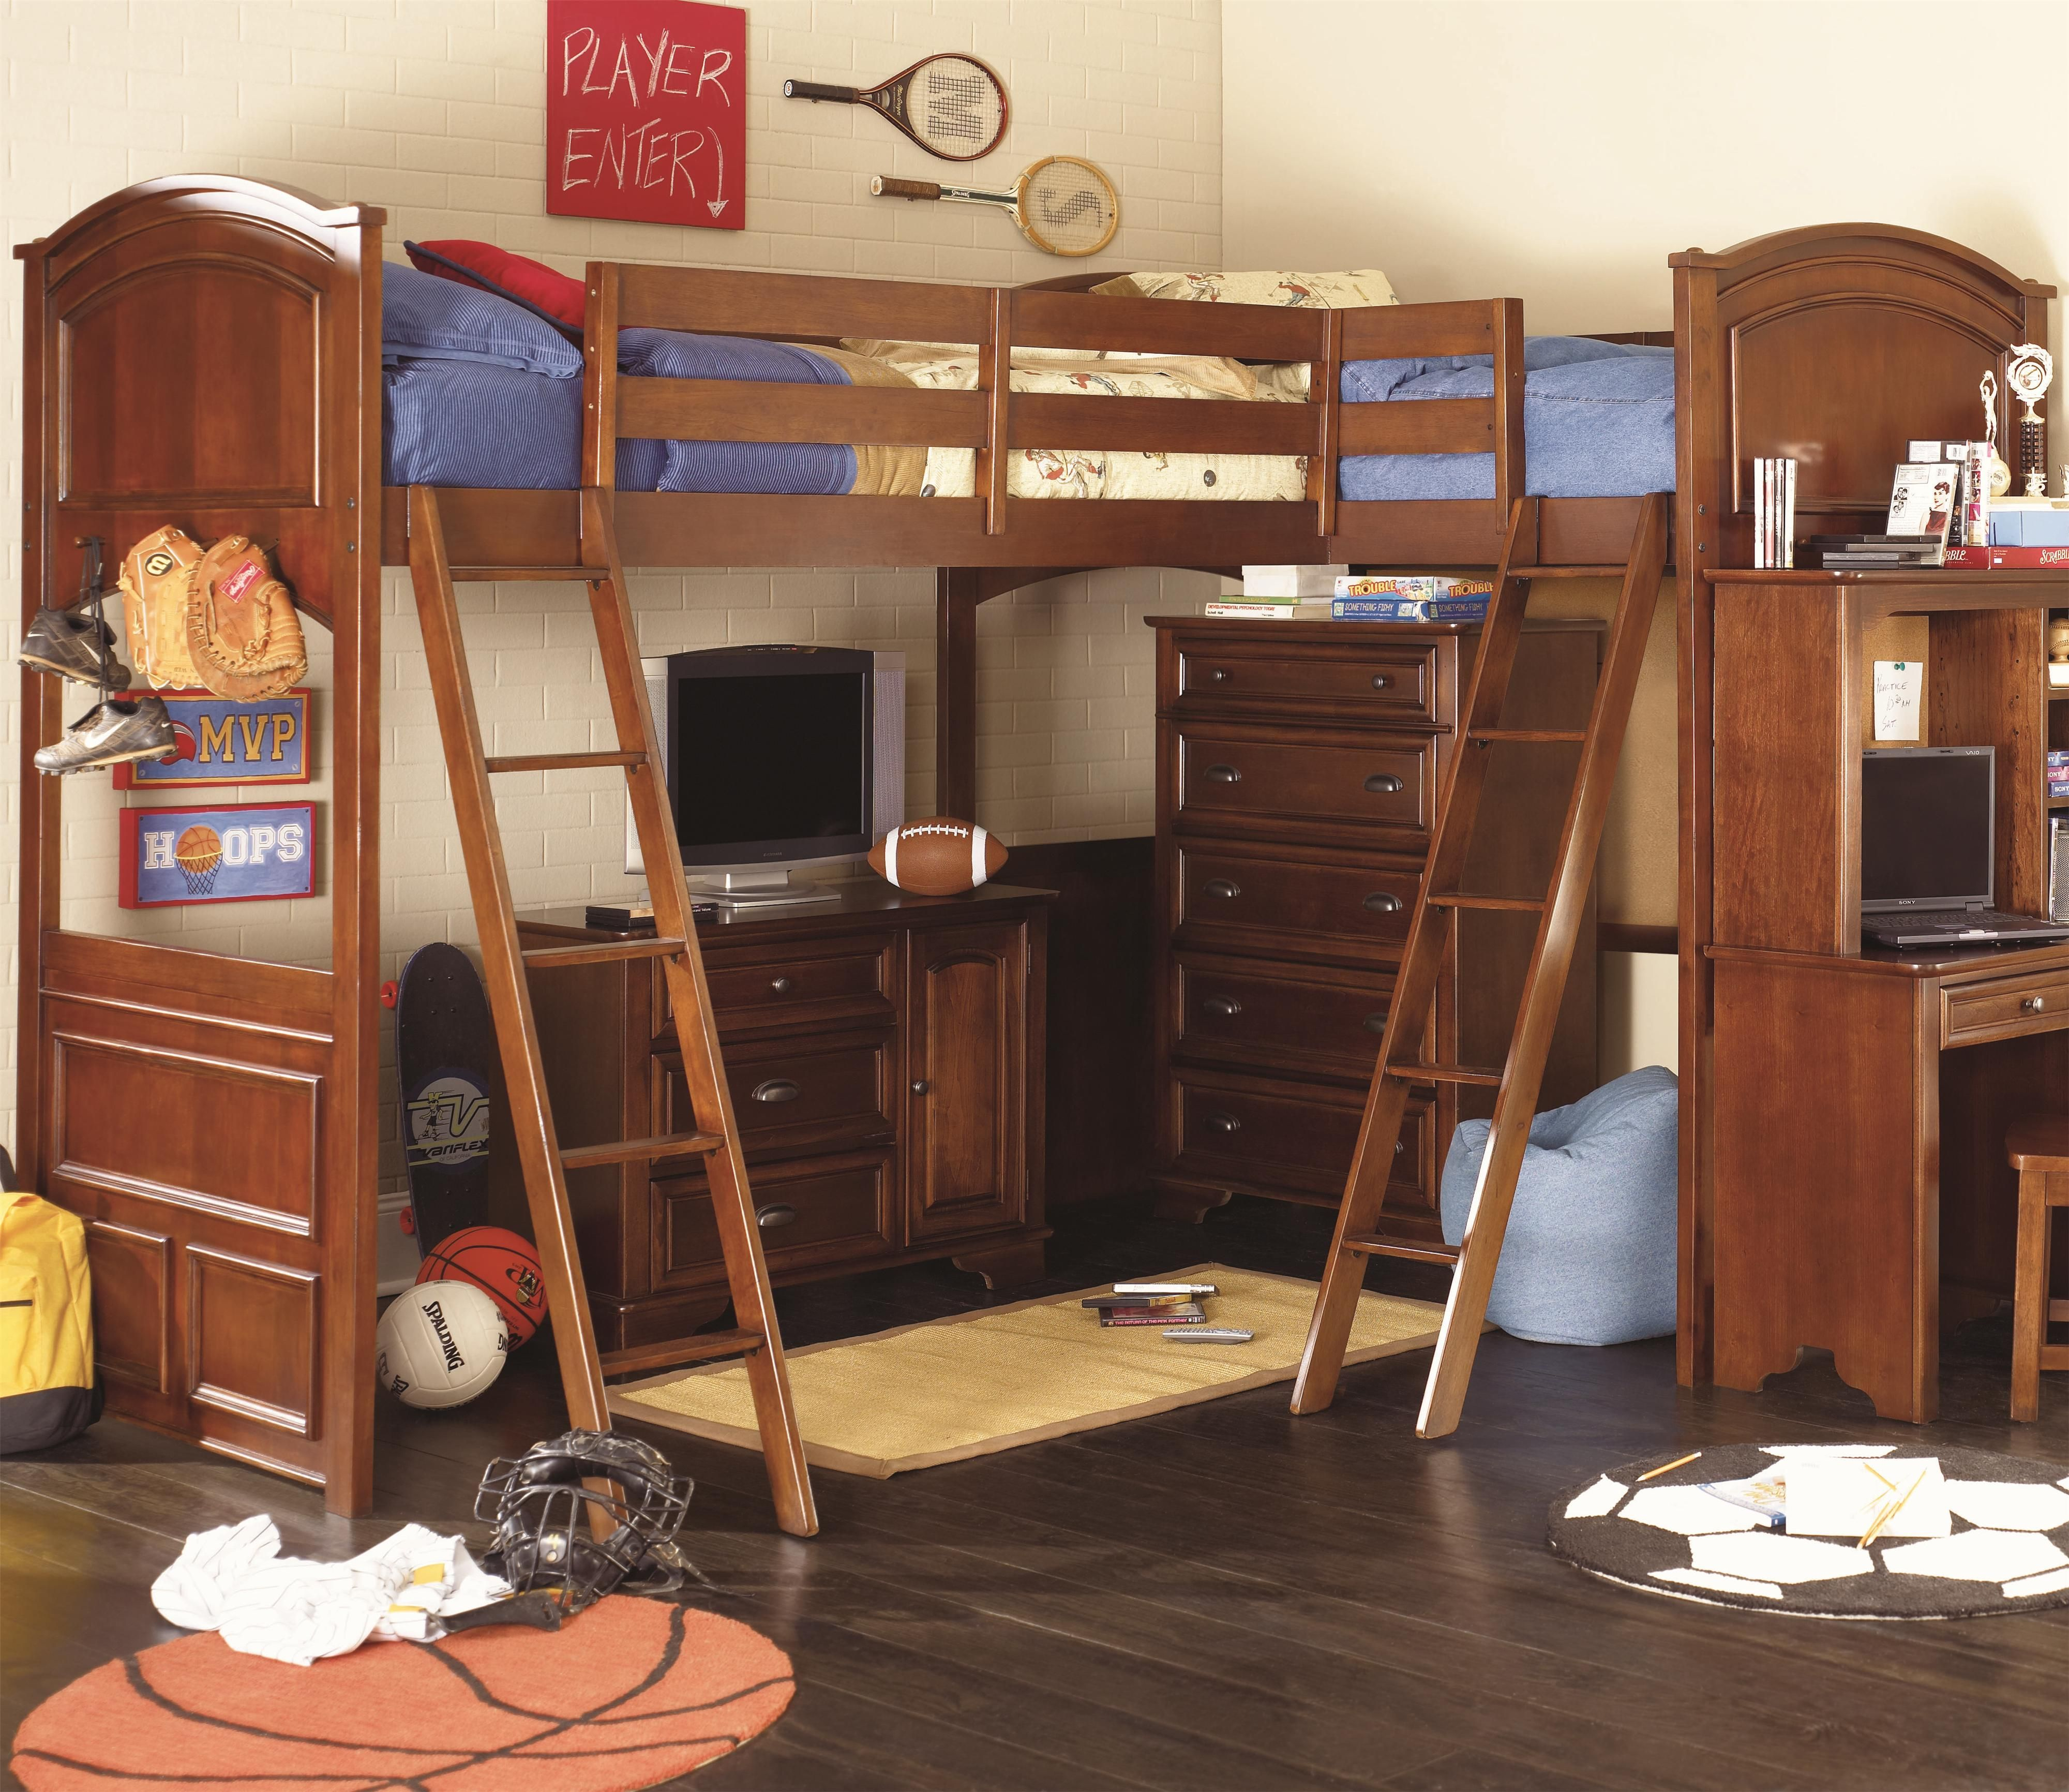 Loft bed ideas for kids  Deer Run BiLoft Bed by Lea Industries  Basment bed room